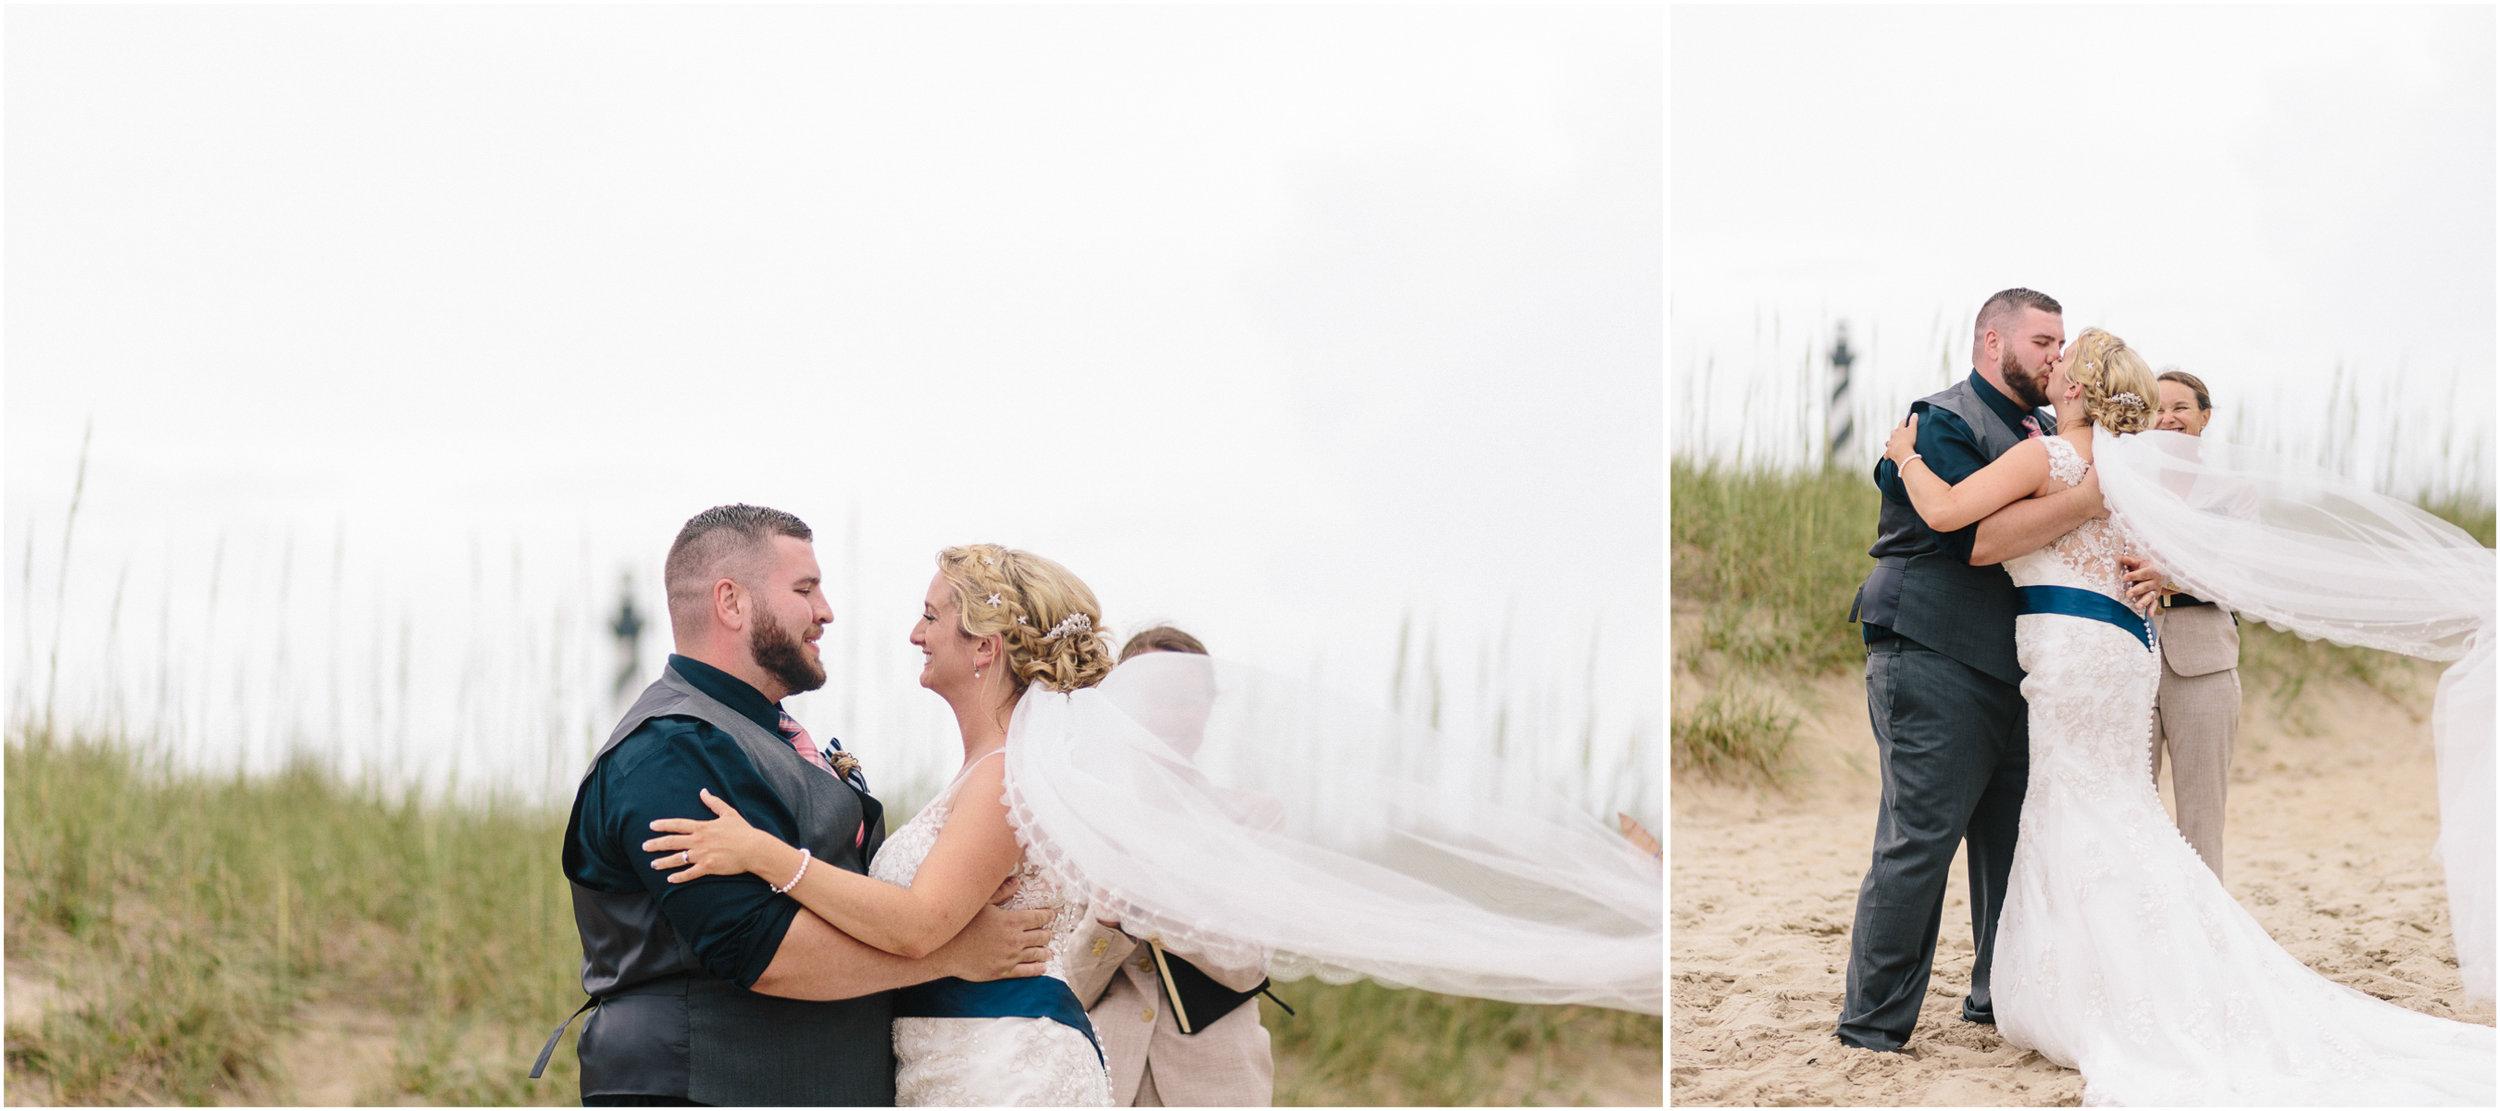 alyssa barletter photography buxton north carolina outer banks obx cape hatteras elopement intmate beach wedding-26.jpg